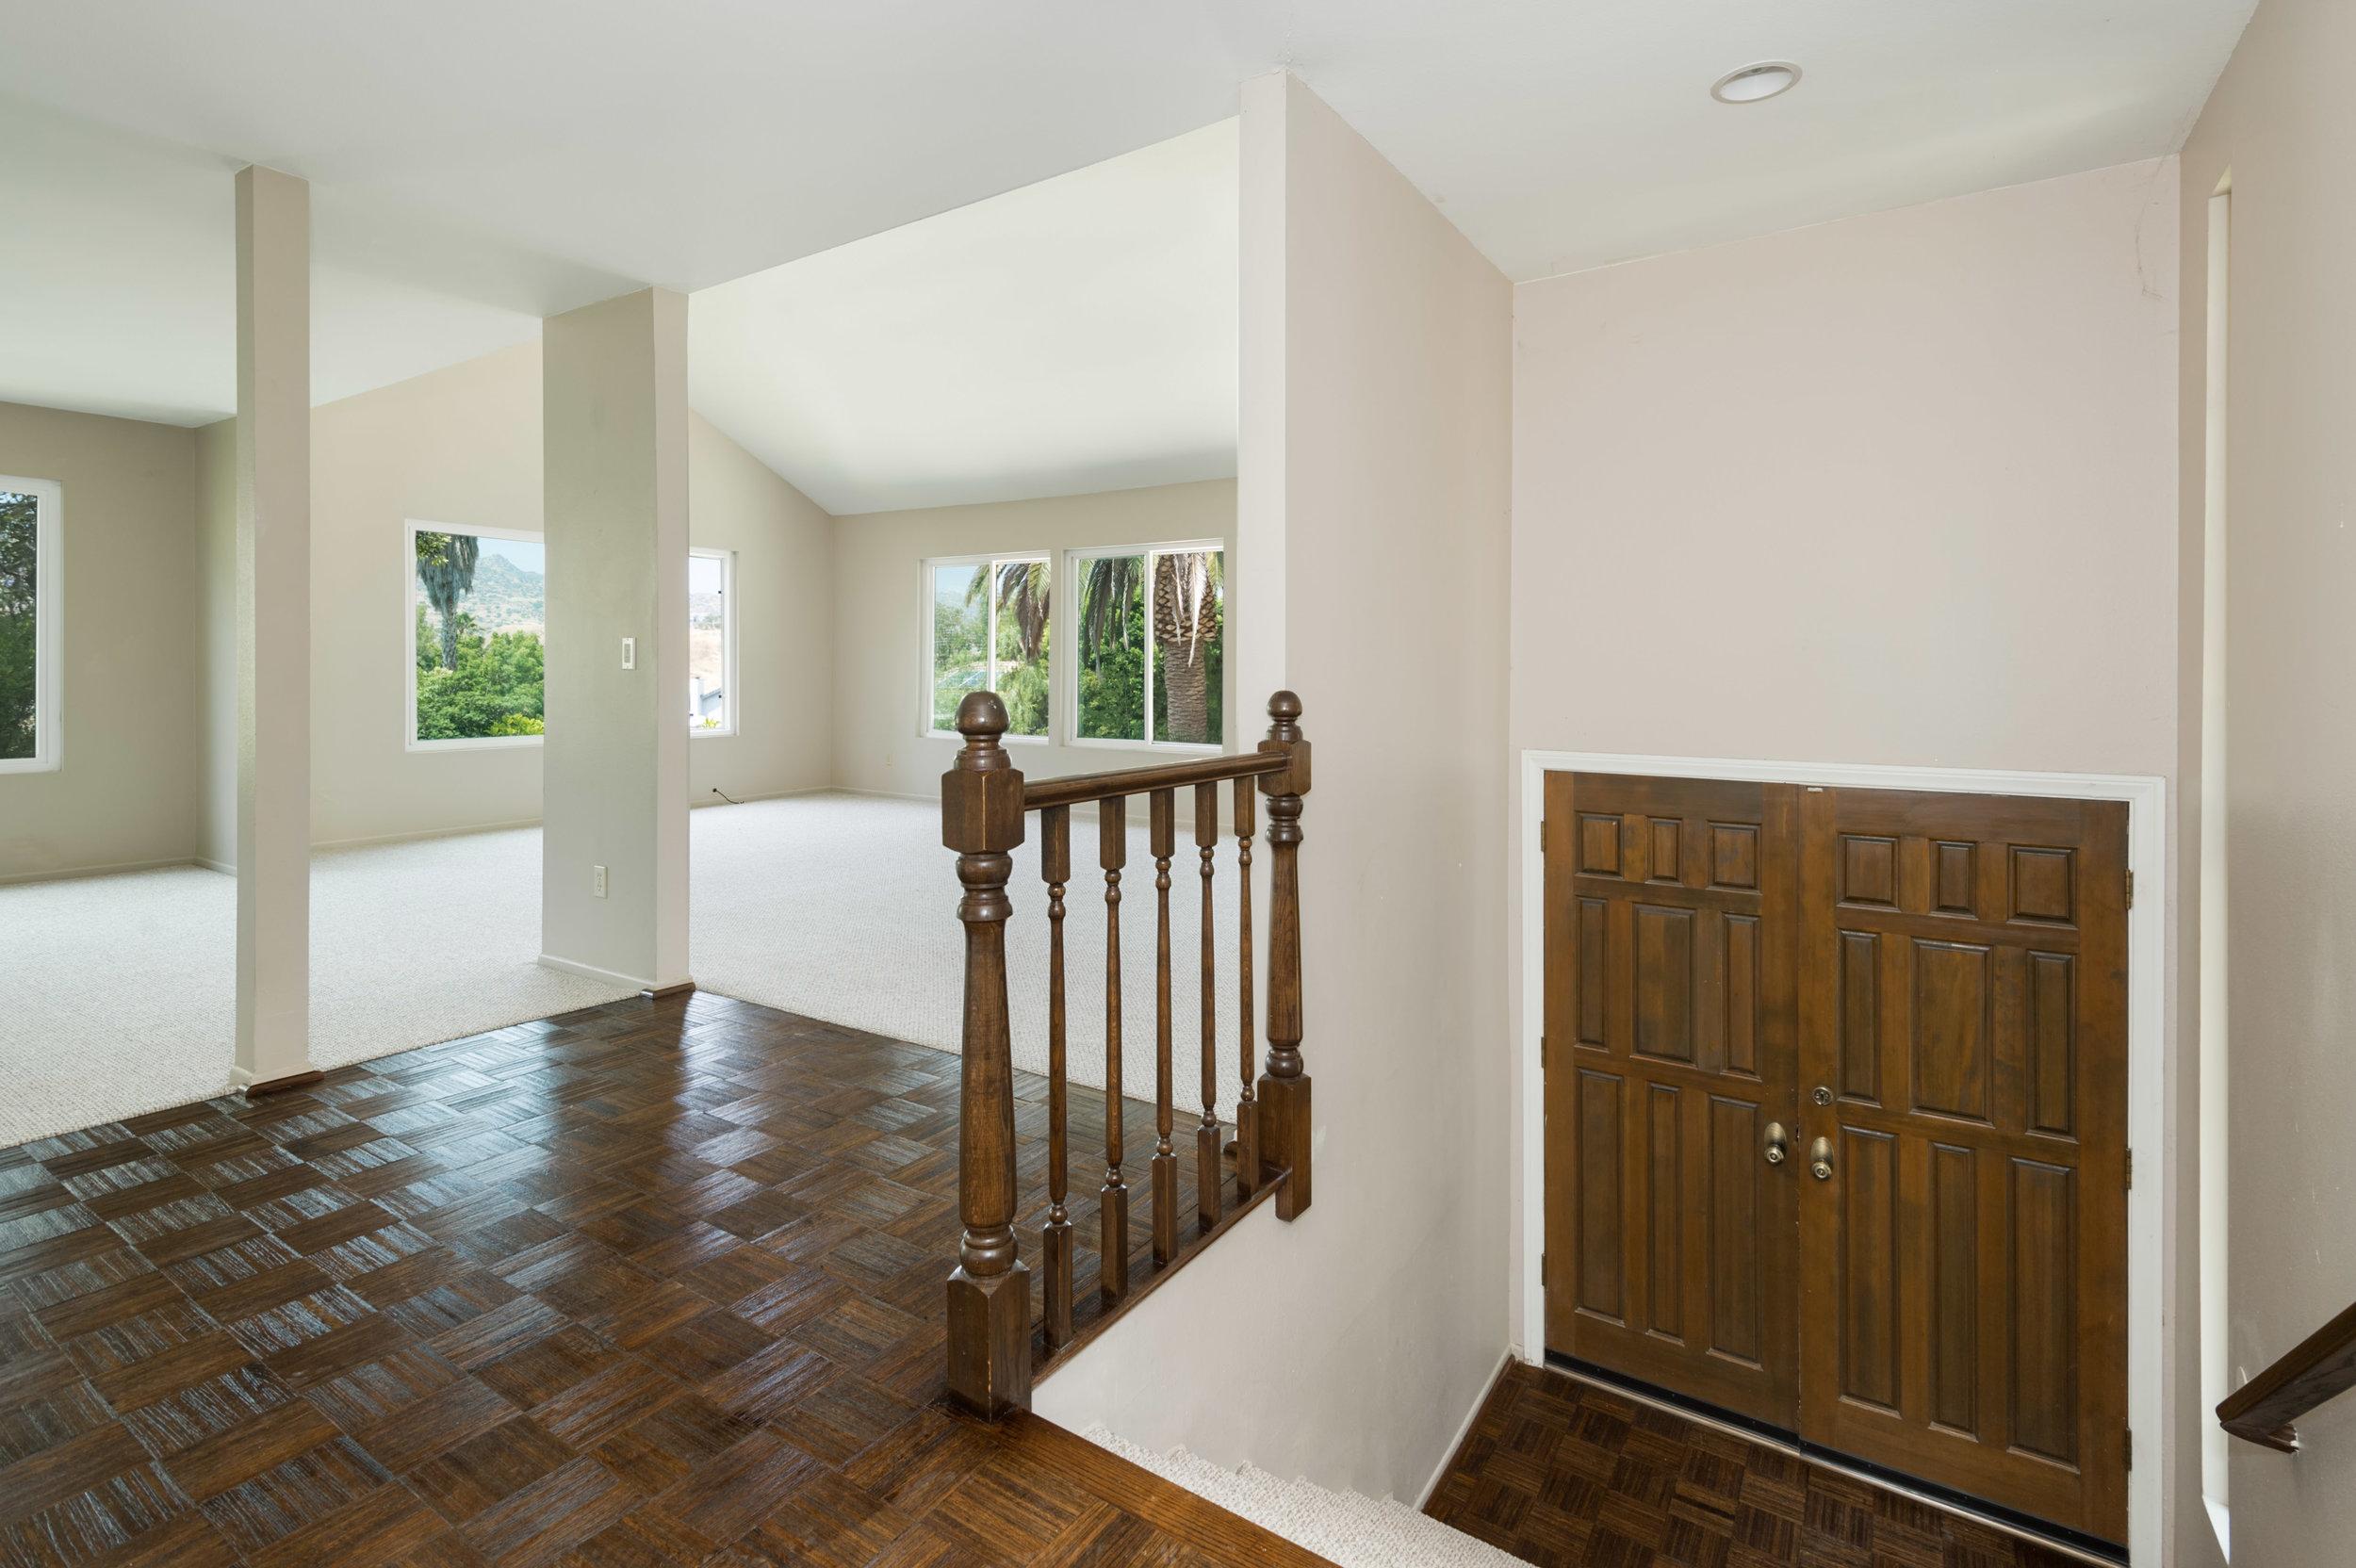 008 entry 8832 Moorcroft Avenue West Hills For Sale Lease The Malibu Life Team Luxury Real Estate.jpg